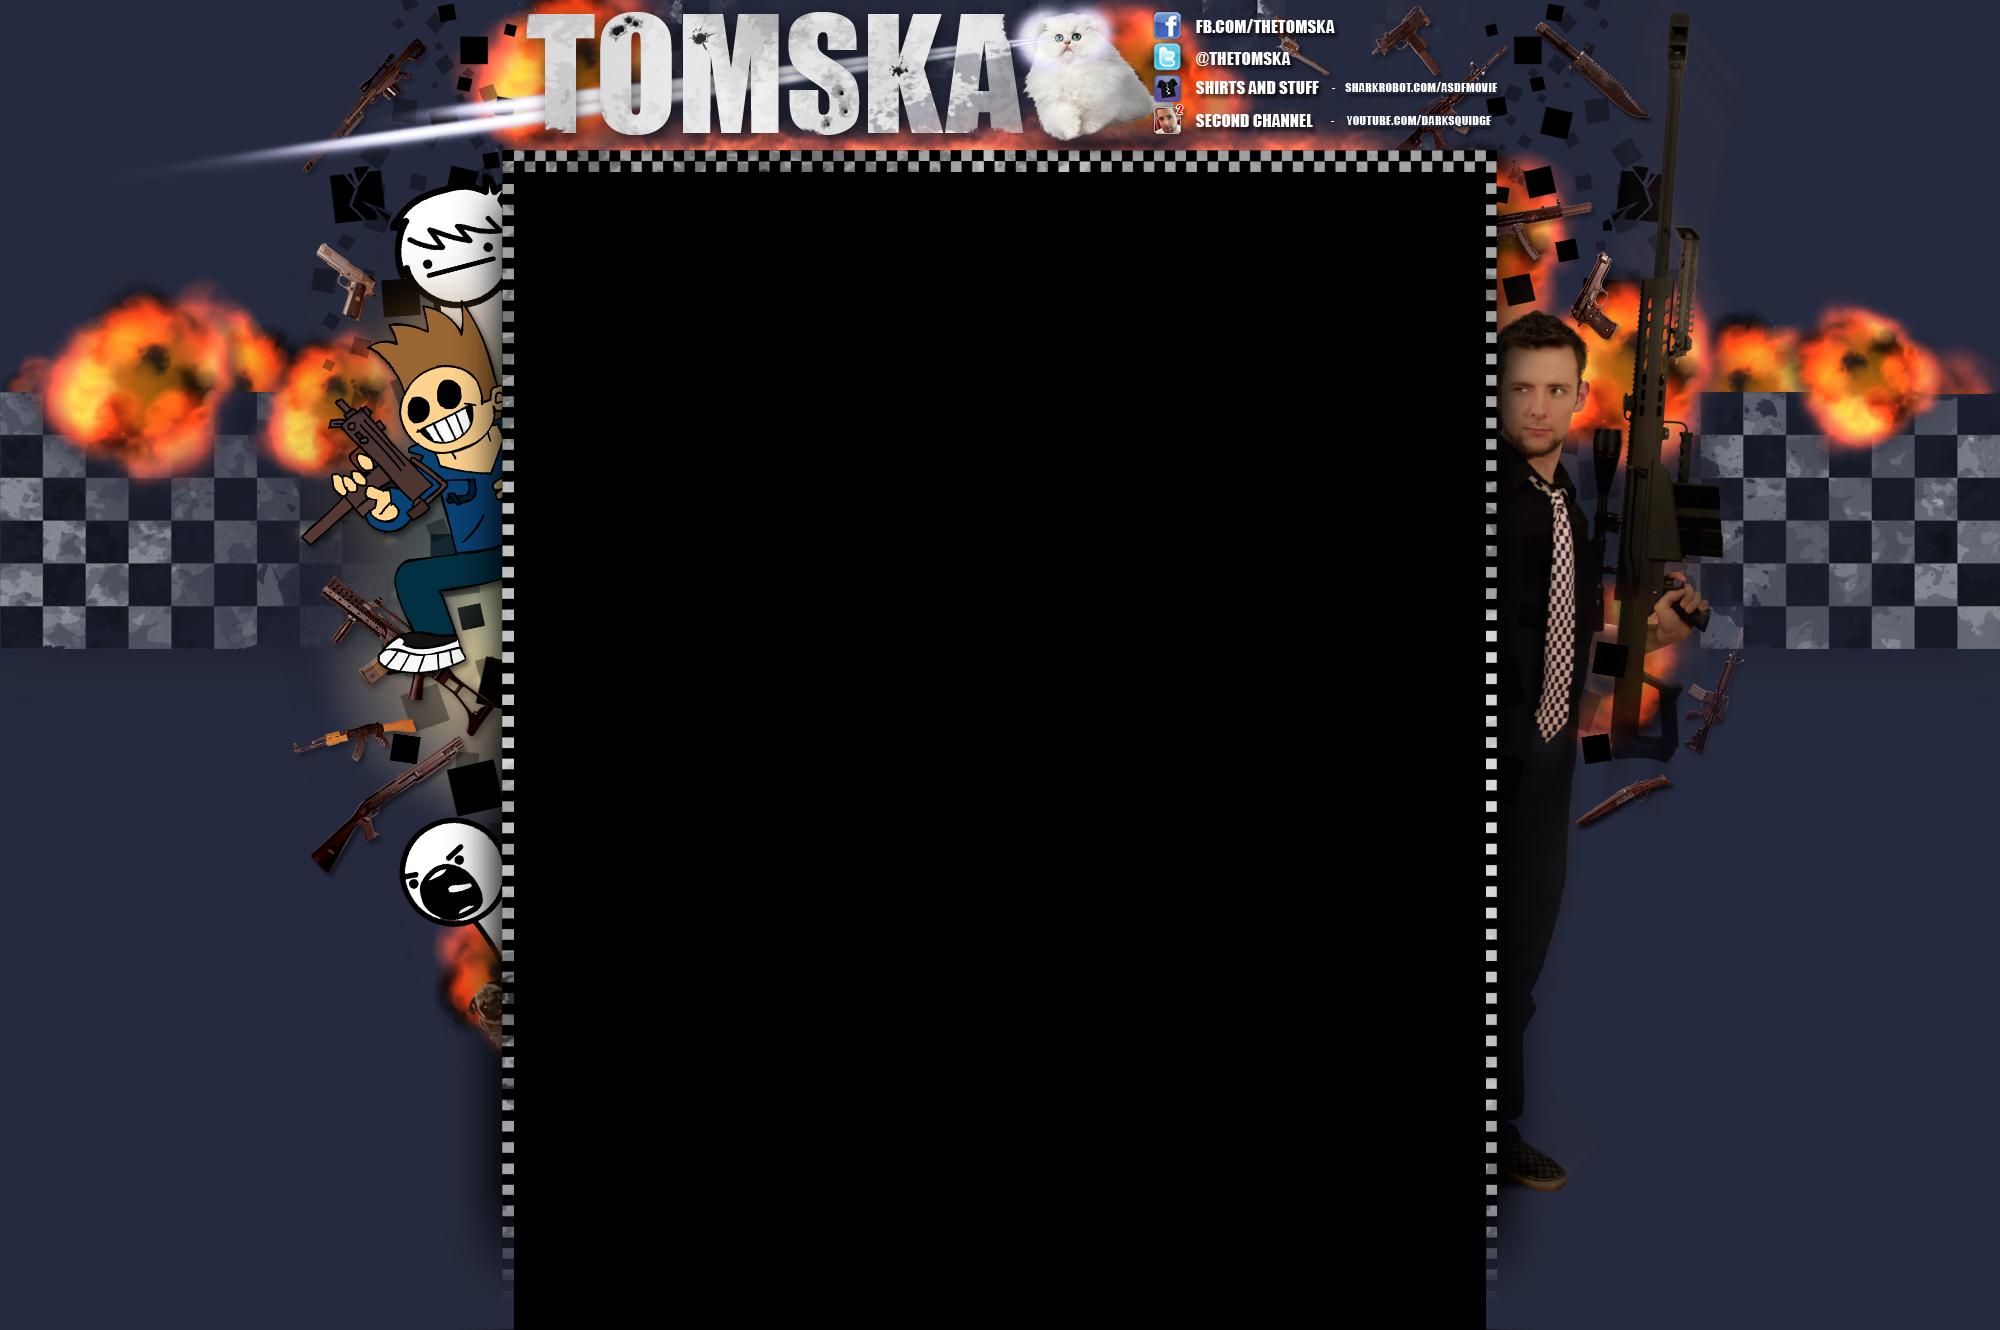 Tomska Images Tomska S Youtube Background Hd Fond D Ecran And